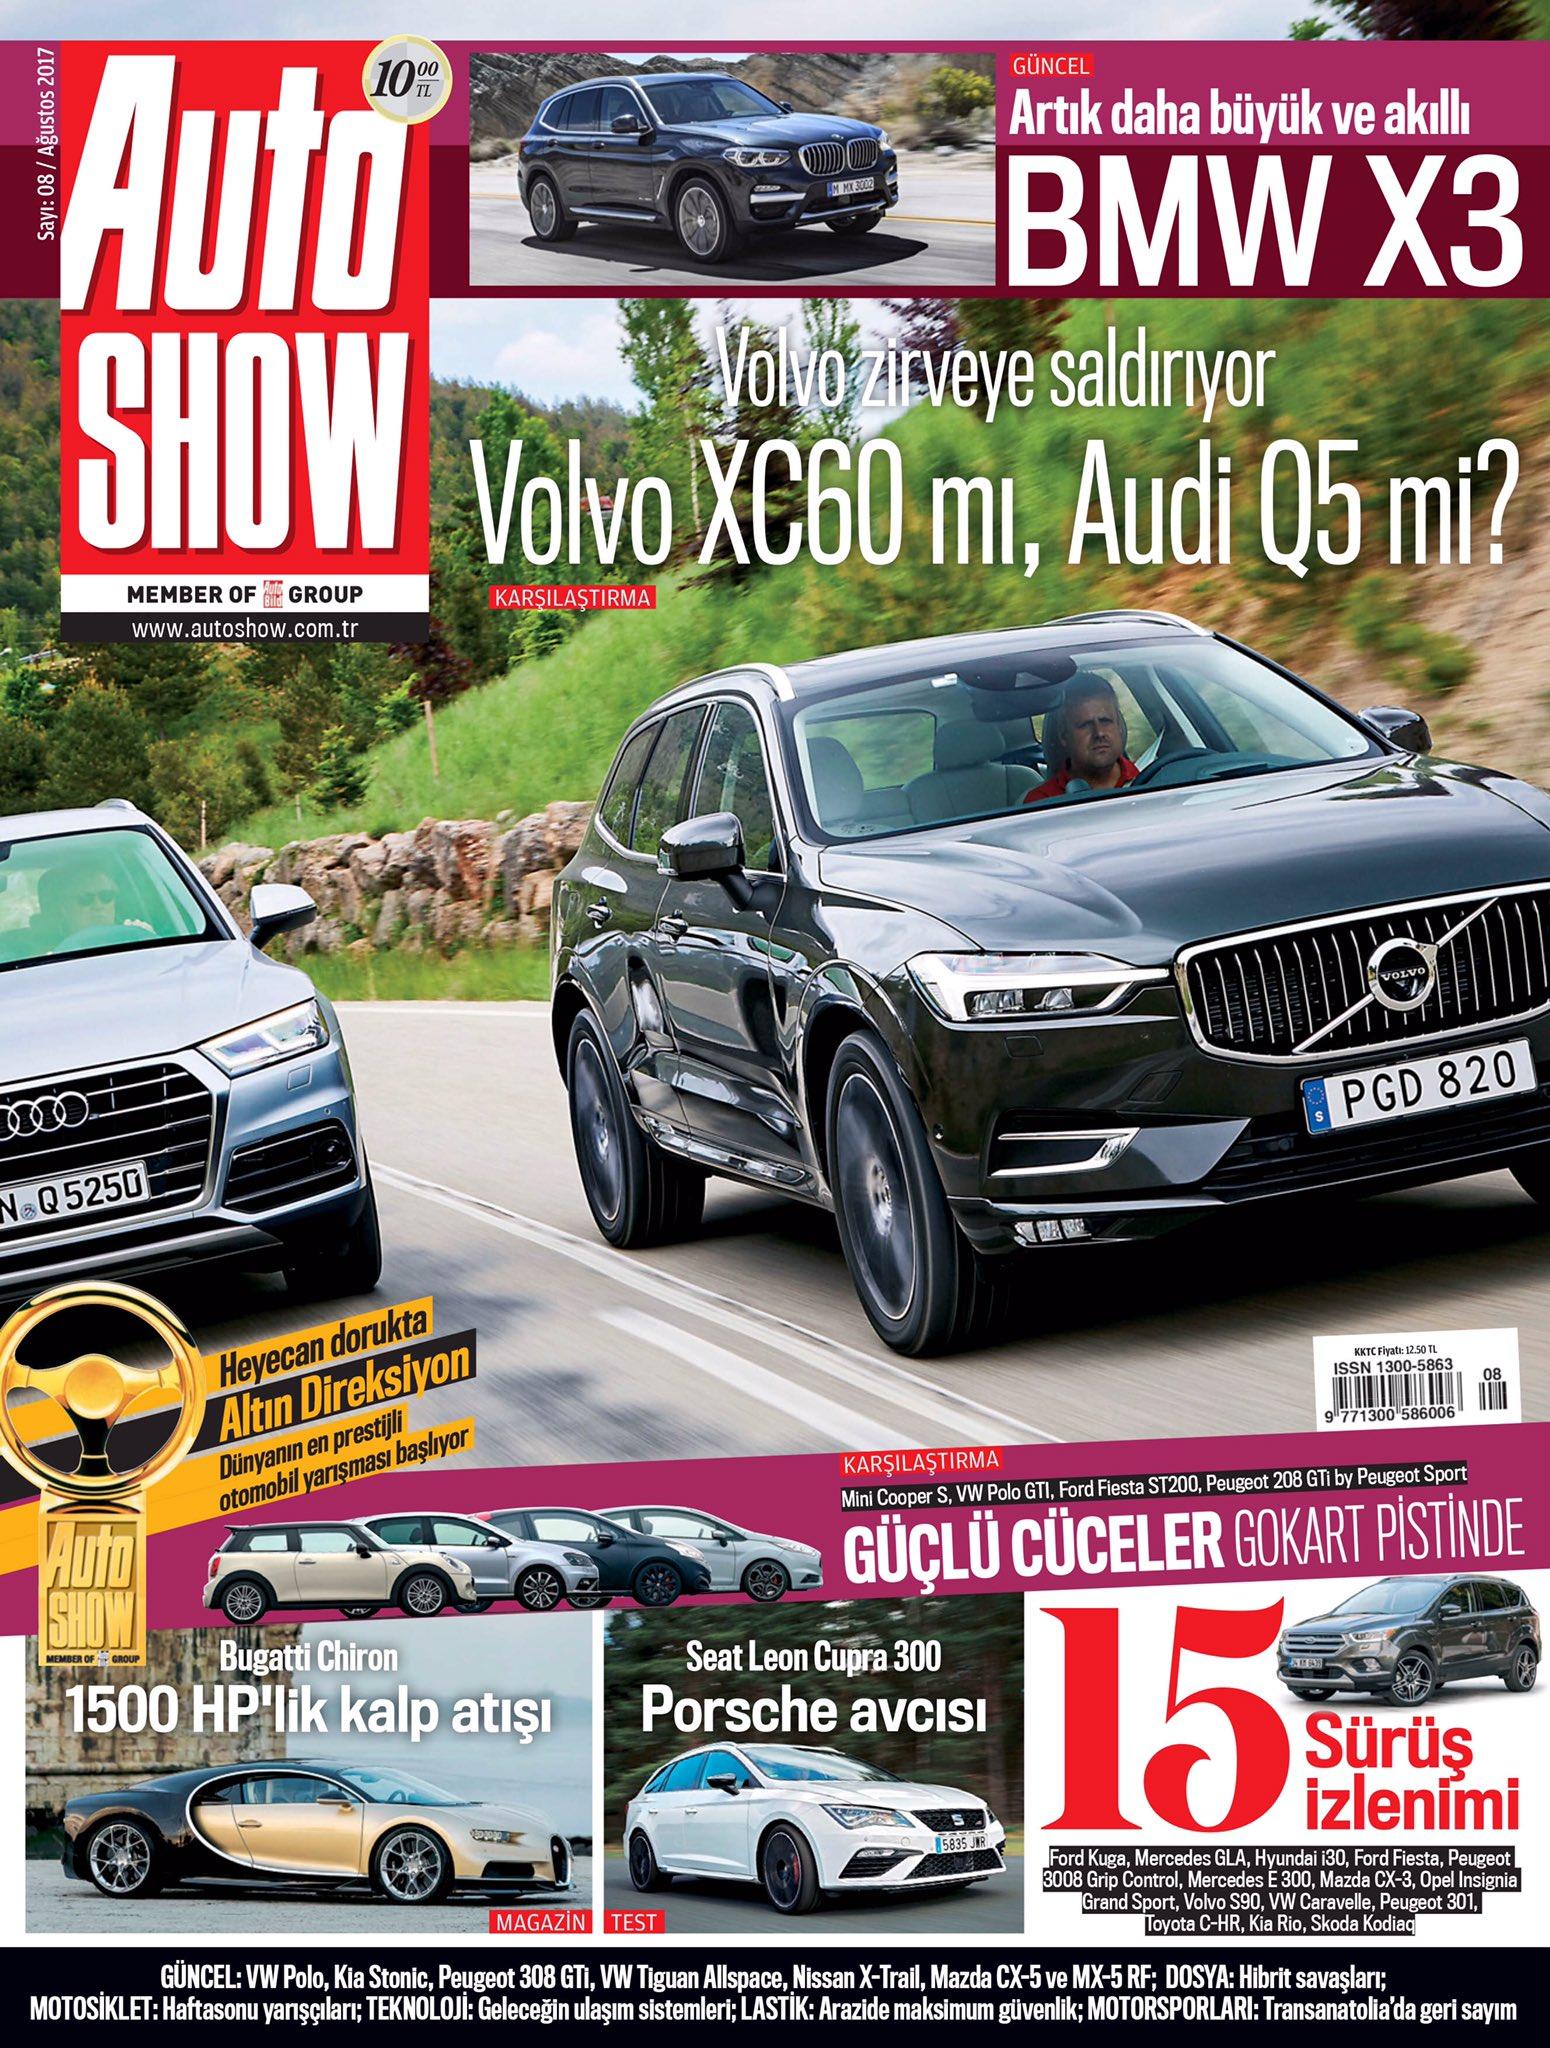 Oto - Magazine cover